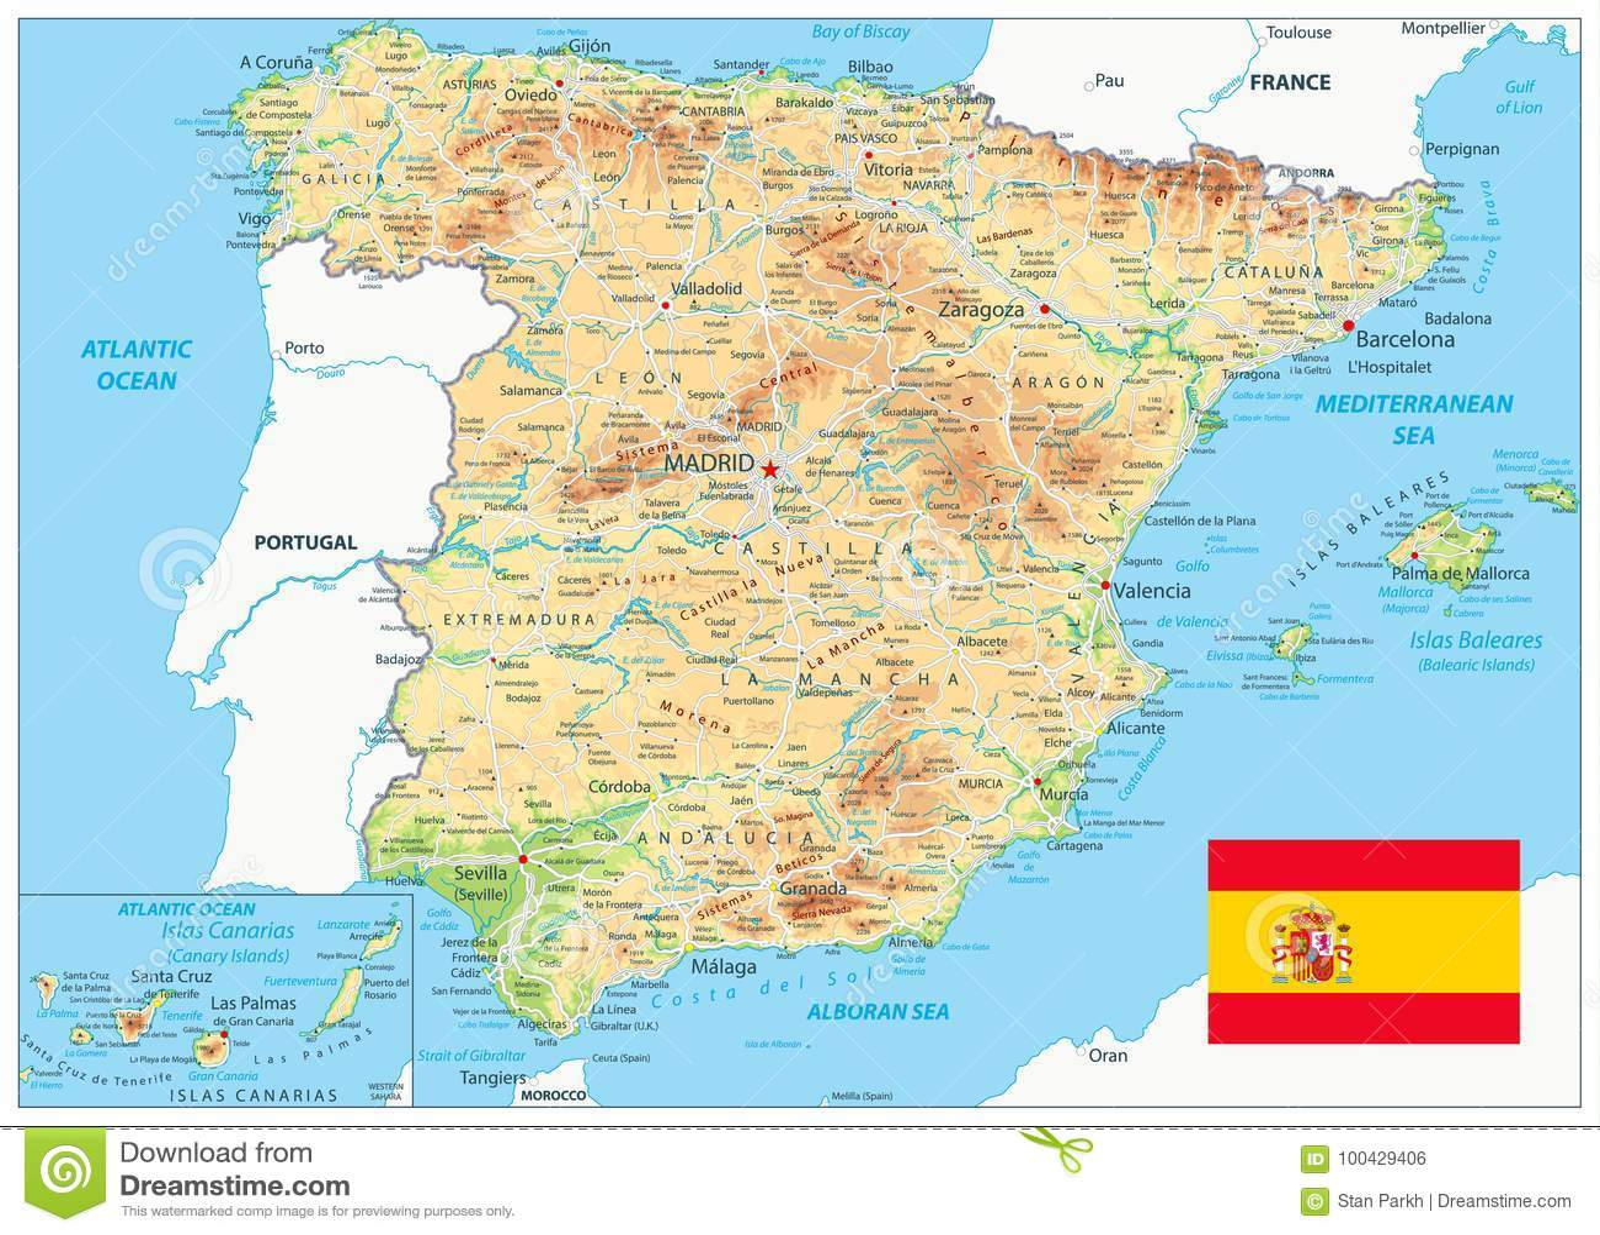 Cartina Jerez De La Frontera.Spain Physical Map Stock Vector Illustration Of Equipment 100429406